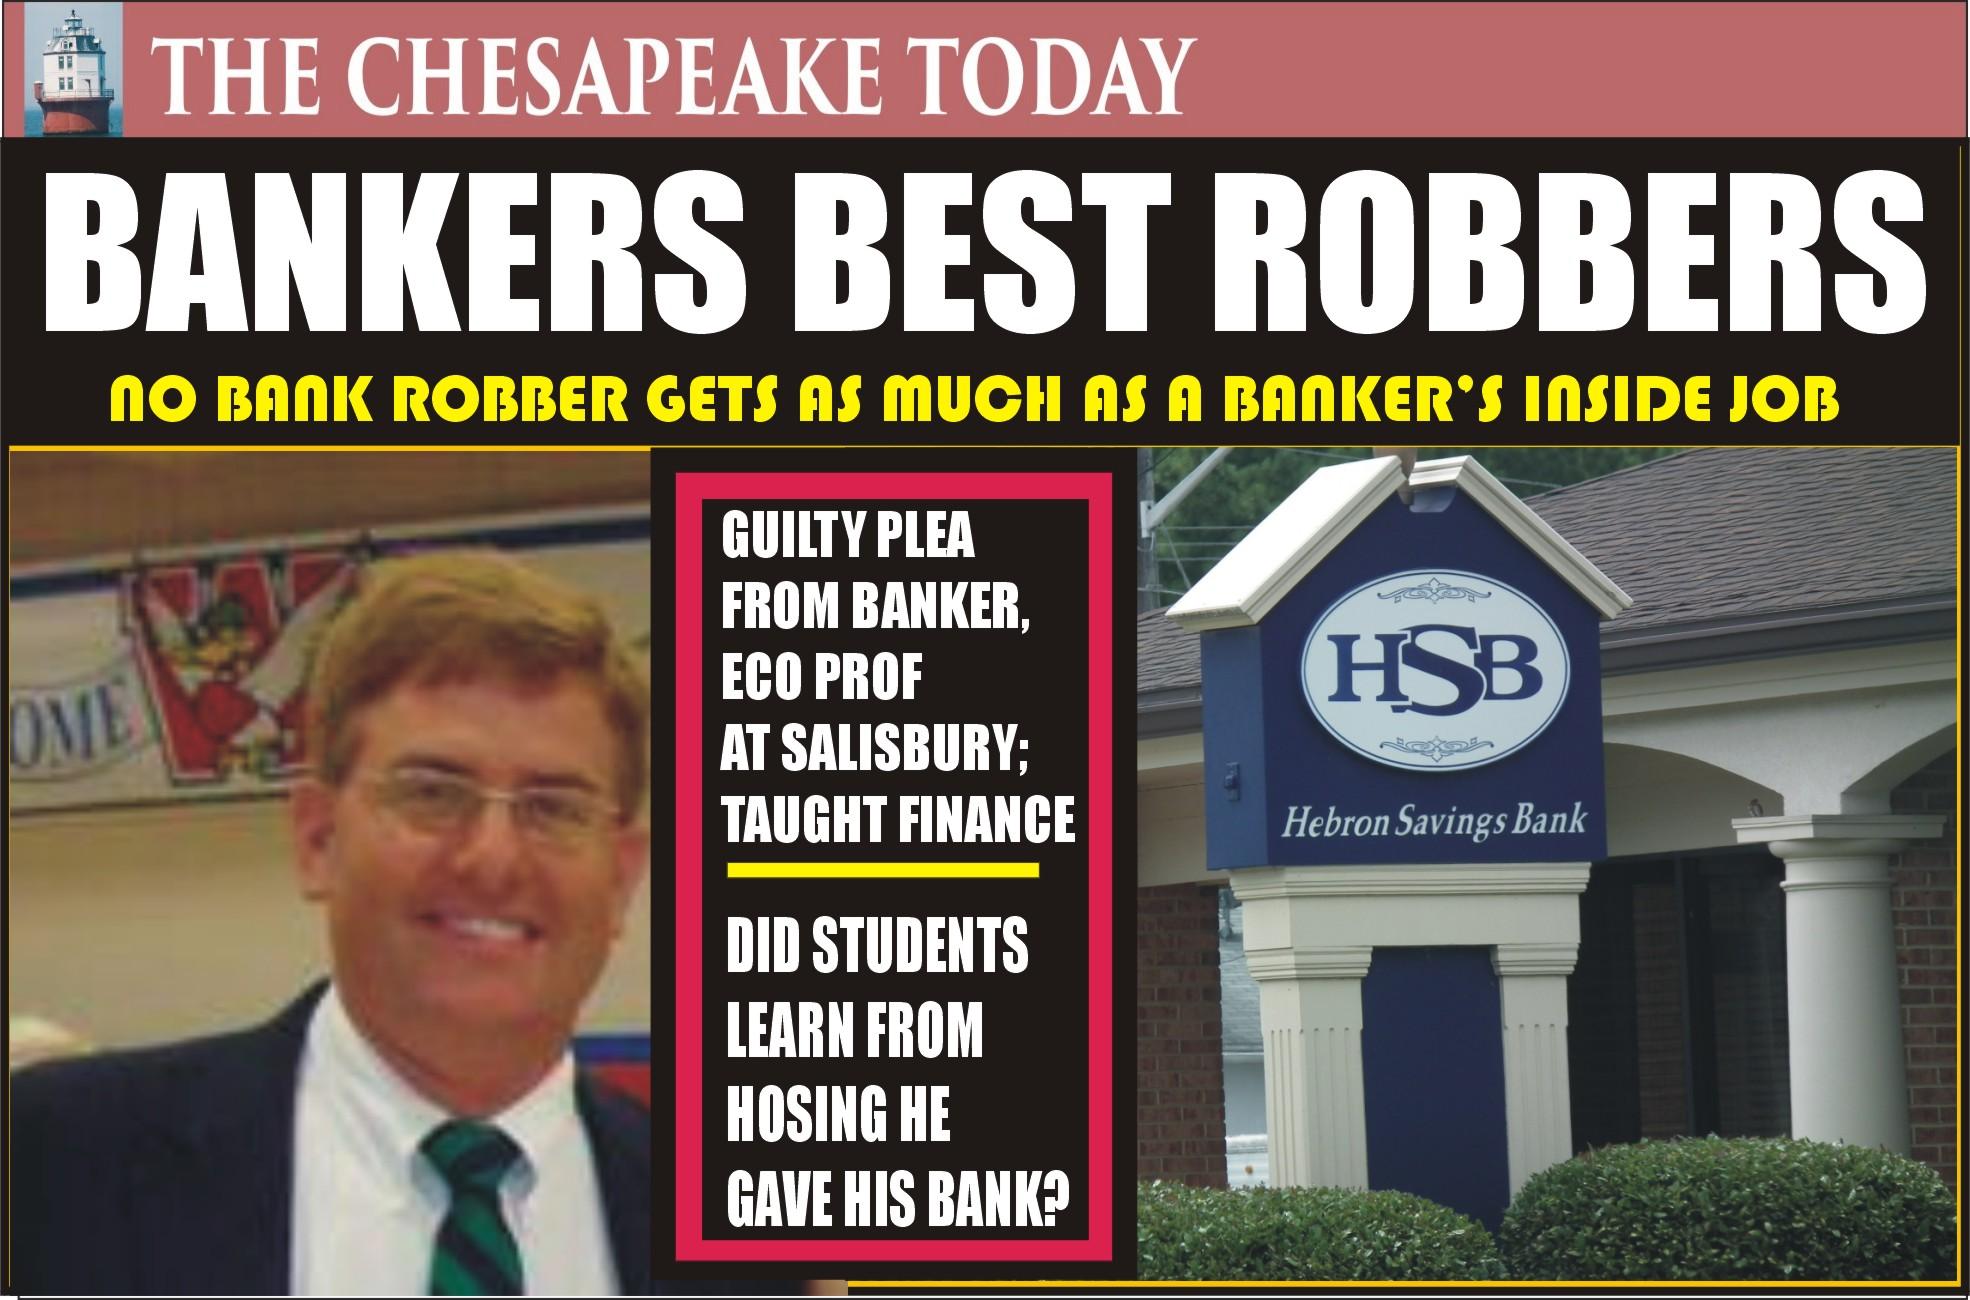 BANK FRAUD:  Fleecing the bank was easier for Salisbury Economics Professor Brian Twilley as he was on the Hebron Savings Bank board of directors